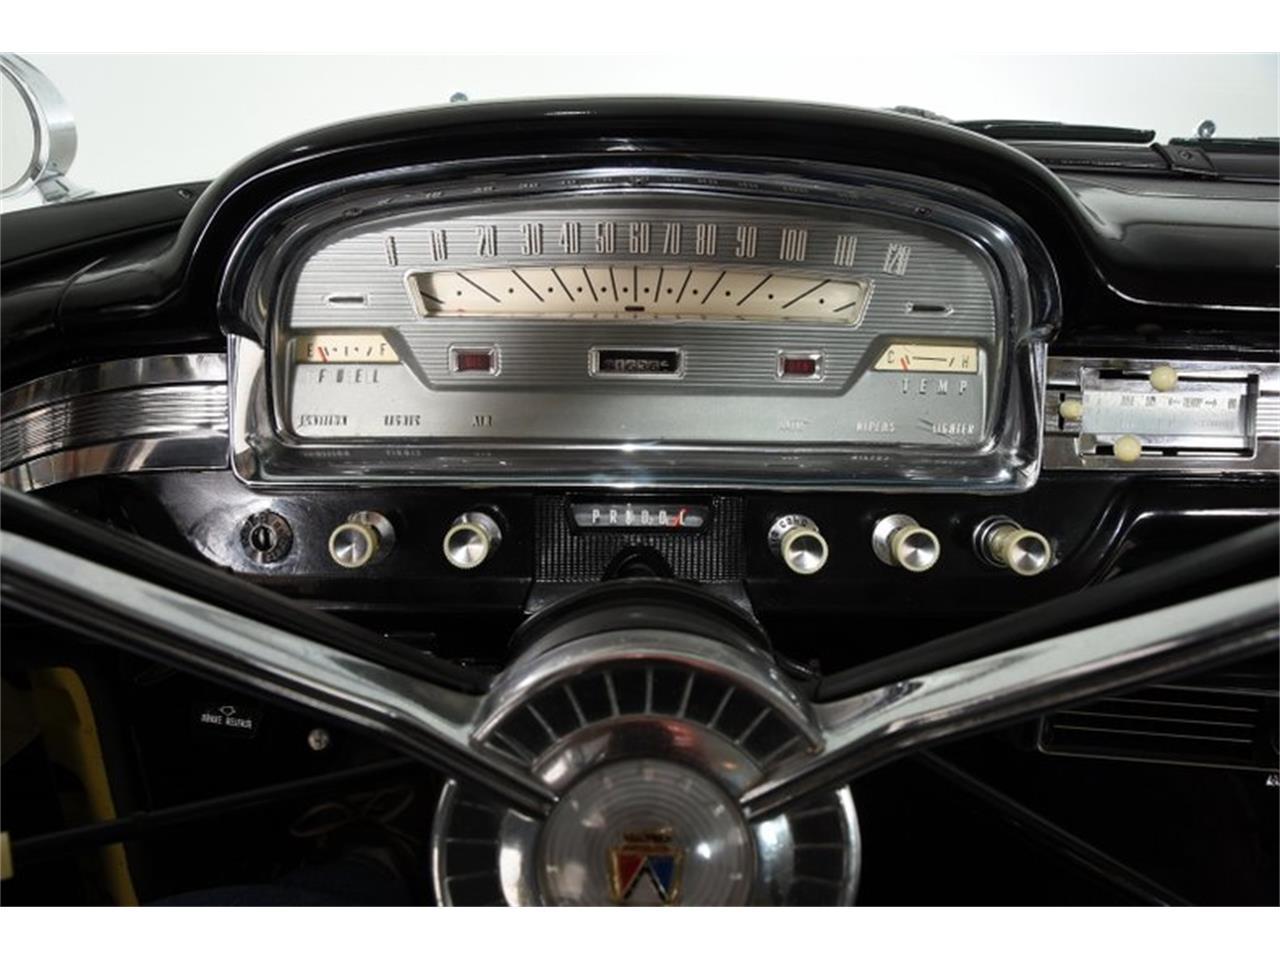 Large Picture of Classic 1959 Fairlane located in Volo Illinois - $42,998.00 - OTK2